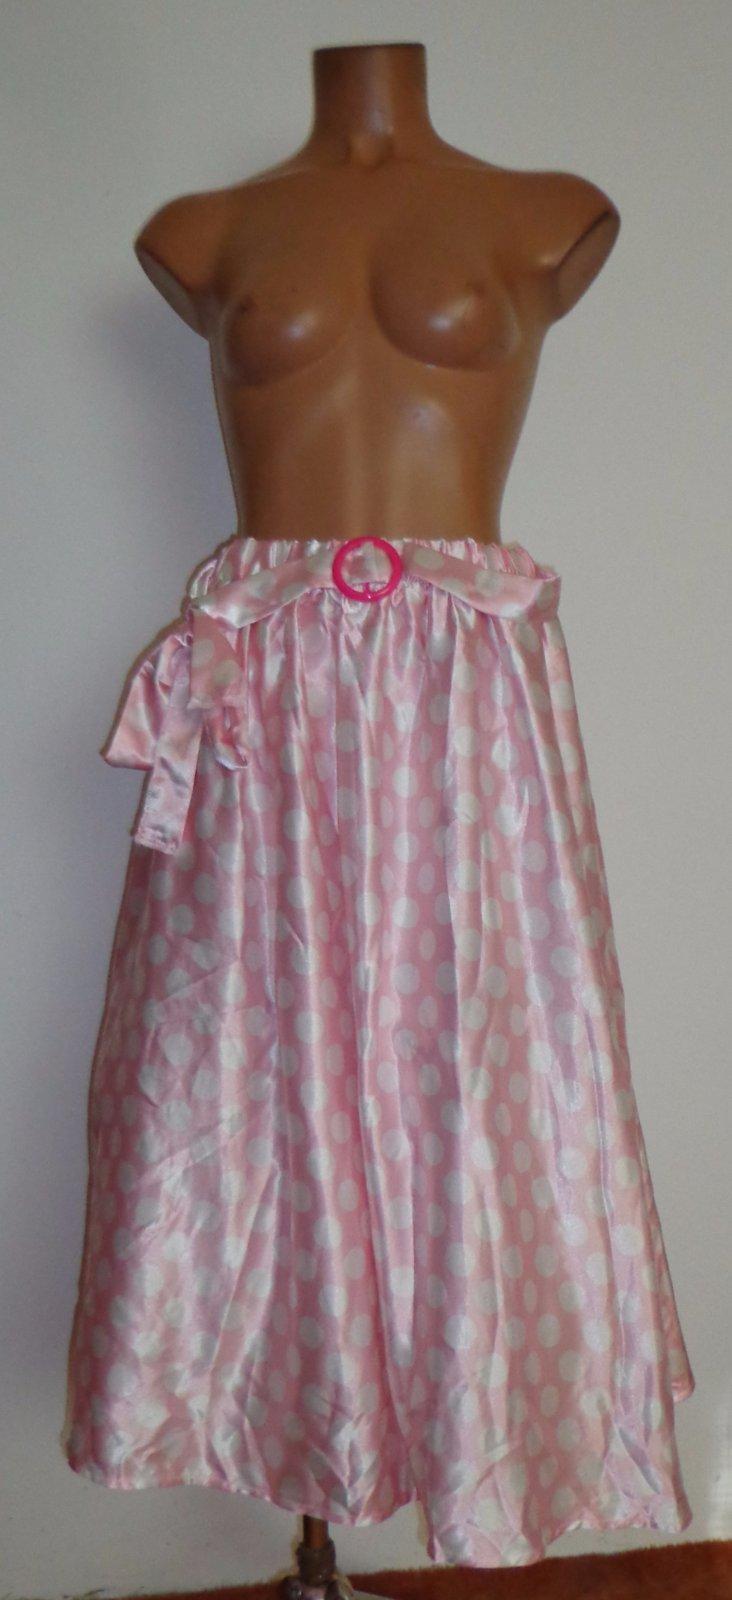 3c3d87b02016 Kostým sukně retro